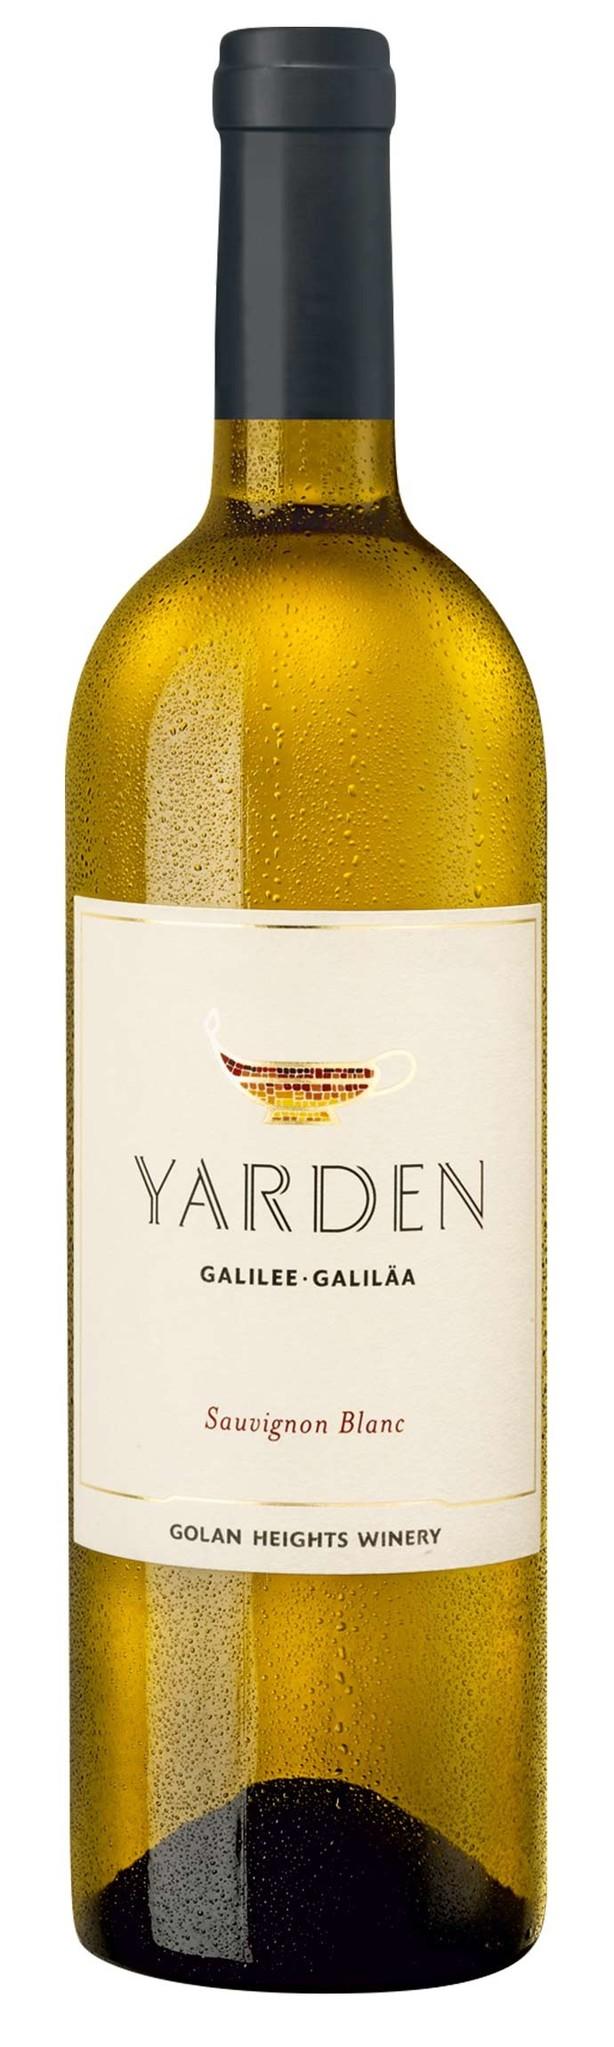 Golan Heights Winery Yarden Sauvignon Blanc, 2019, Made in the Golan Heights, Israeli settlements